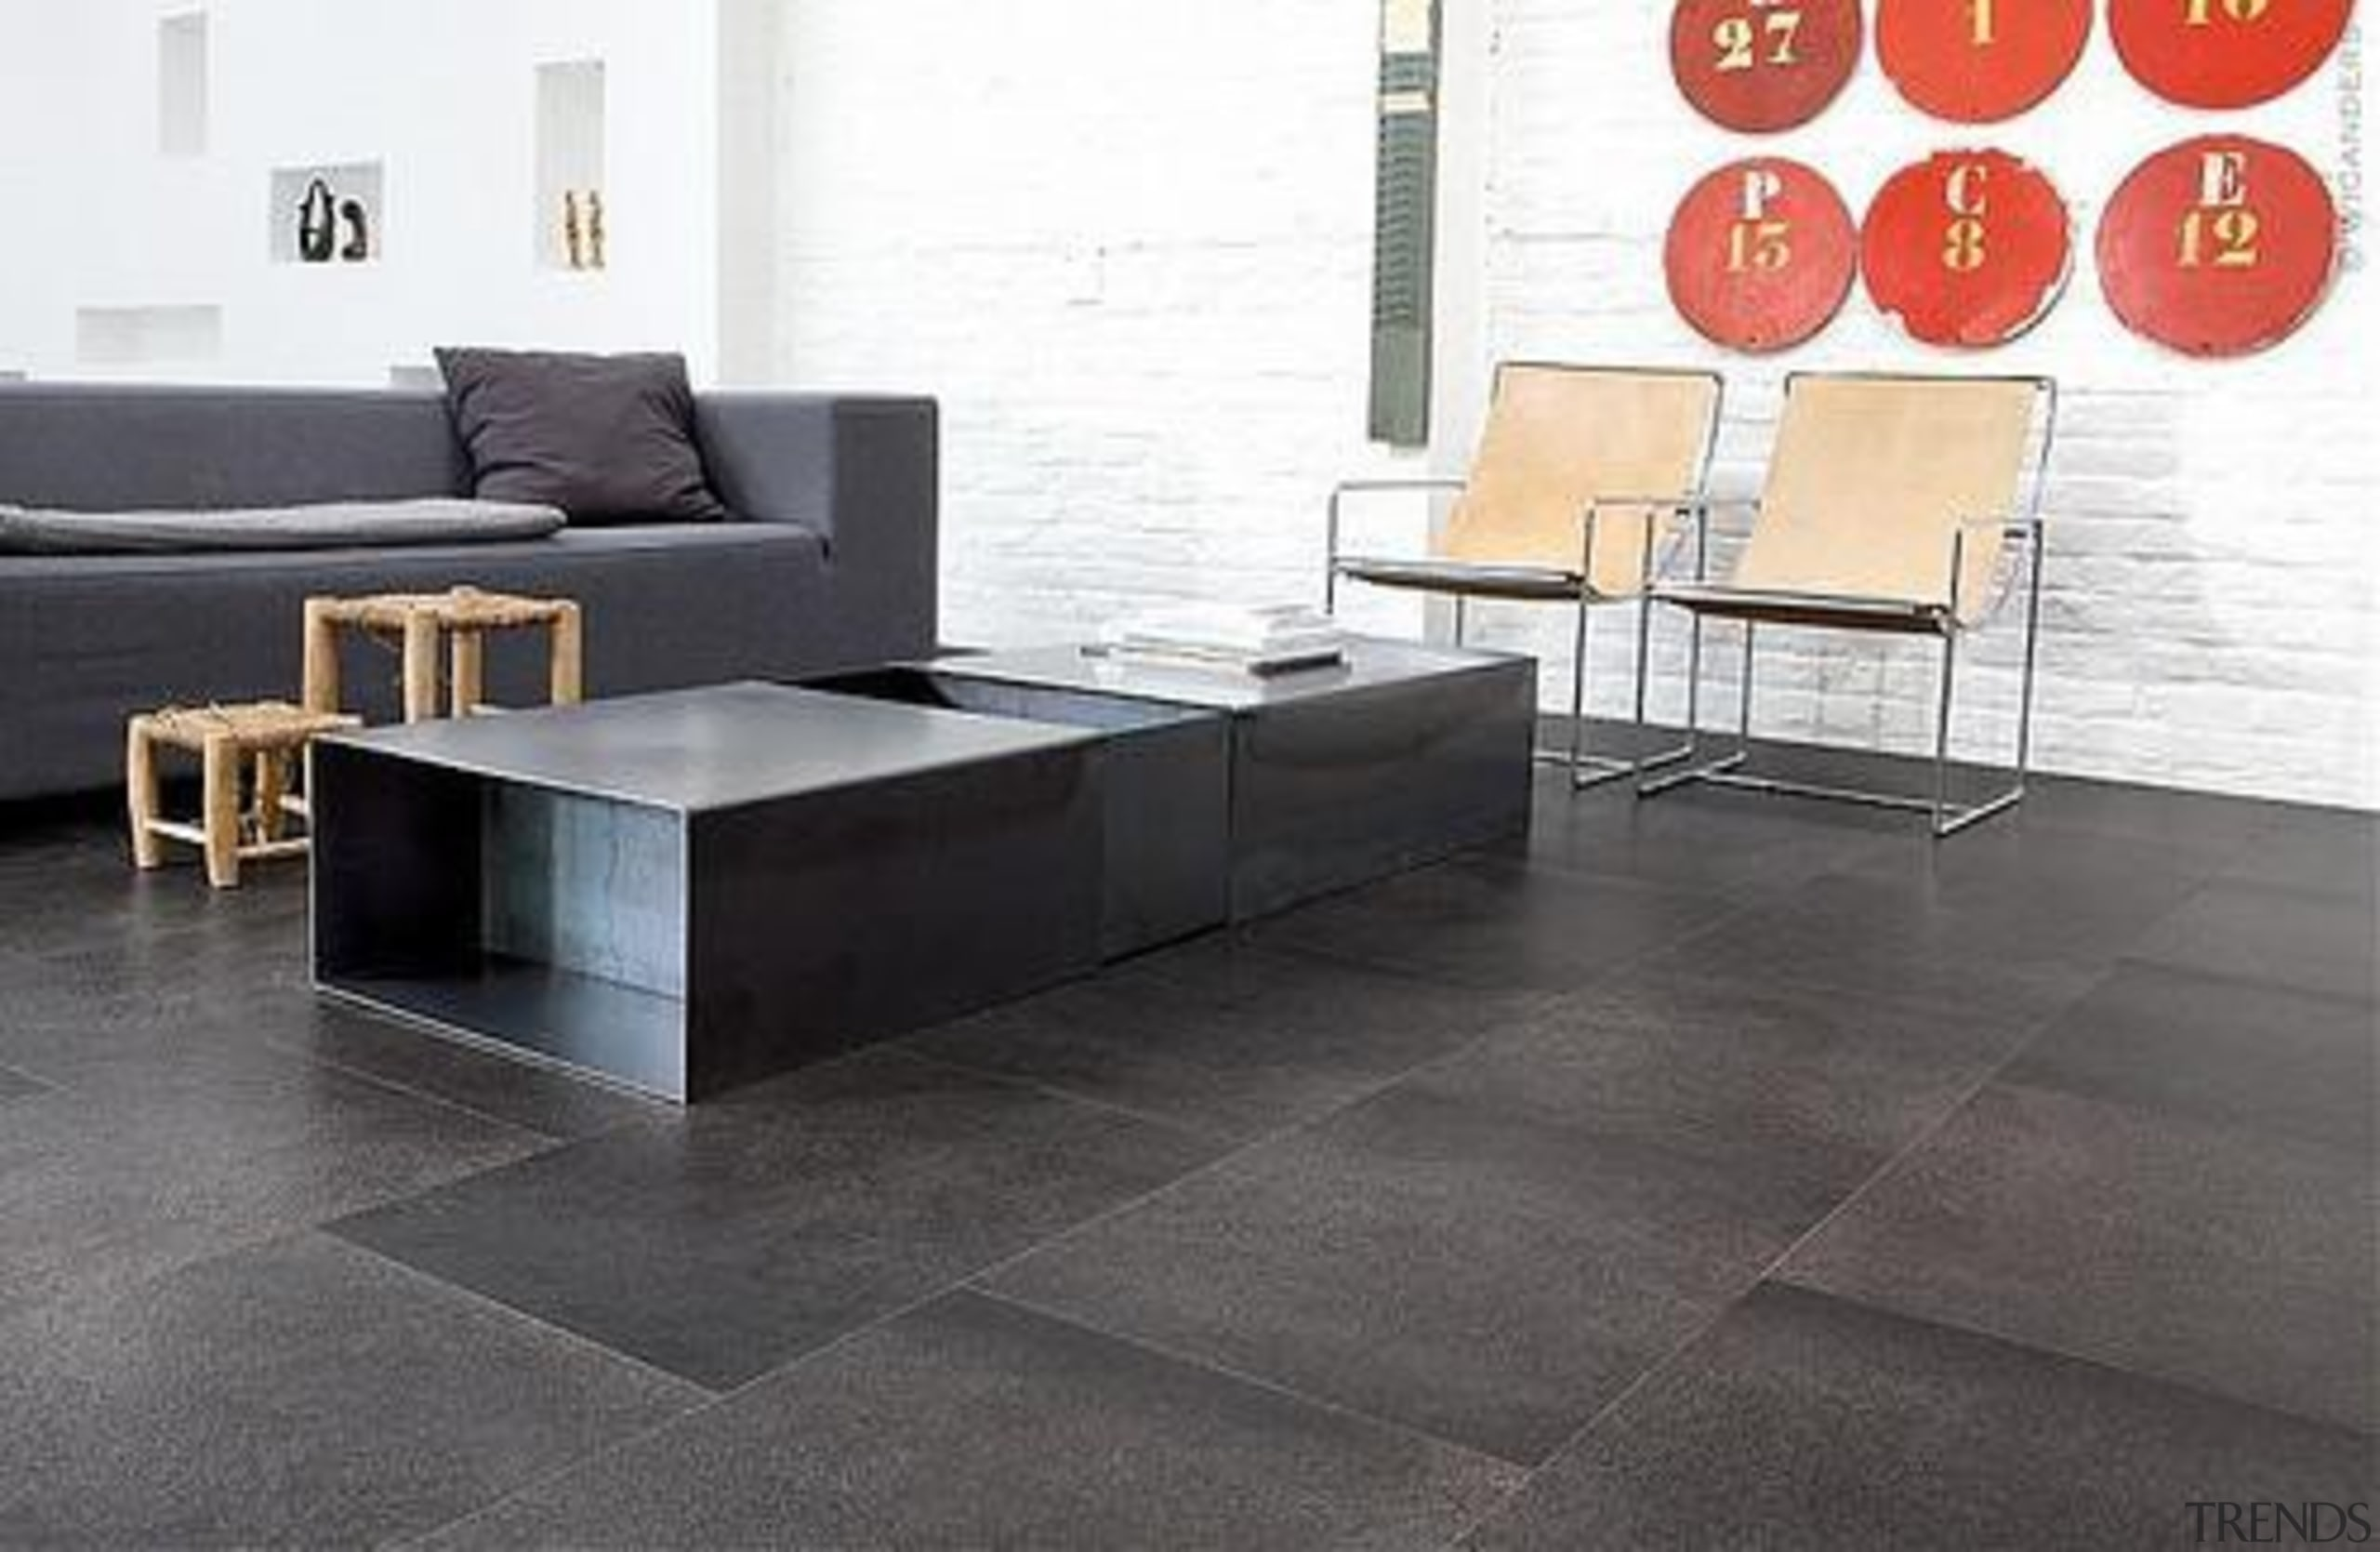 Cork Comfort - Slate Eclipse - Cork Comfort angle, coffee table, floor, flooring, furniture, hardwood, interior design, laminate flooring, living room, product design, table, tile, wall, wood flooring, gray, white, black